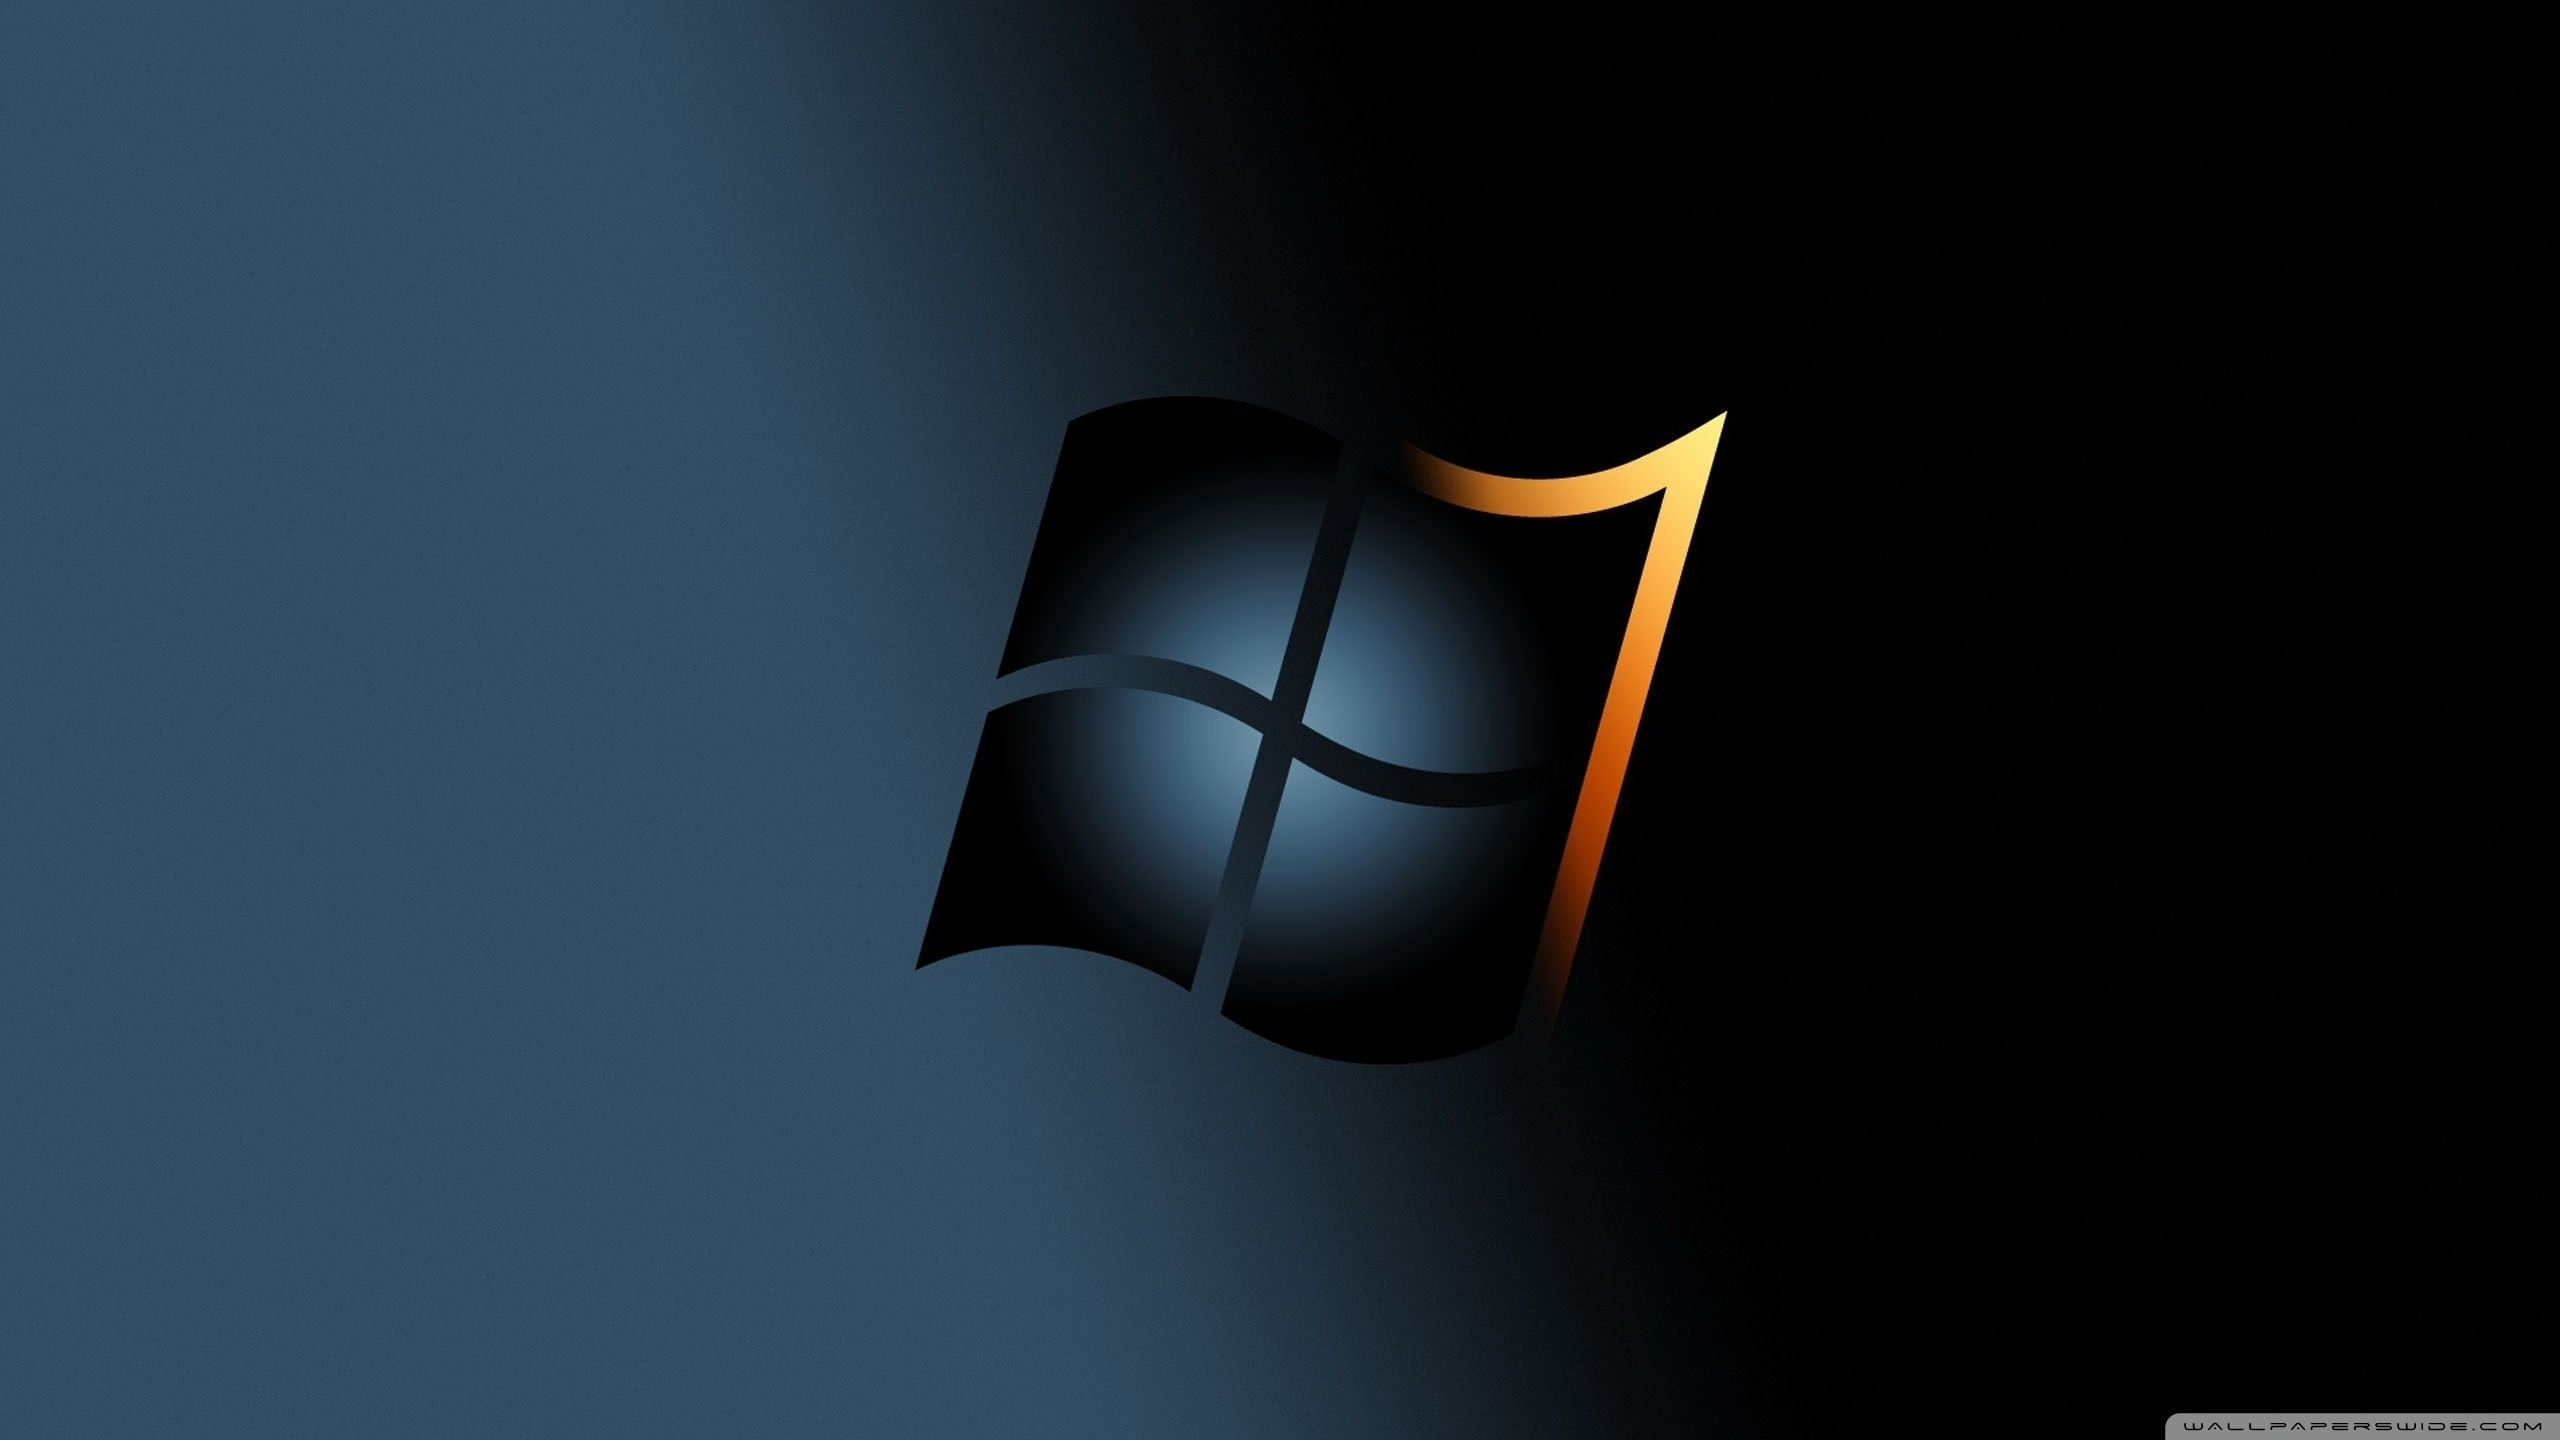 Windows 7 Dark 4K HD Desktop Wallpaper for 4K Ultra HD TV 2560x1440